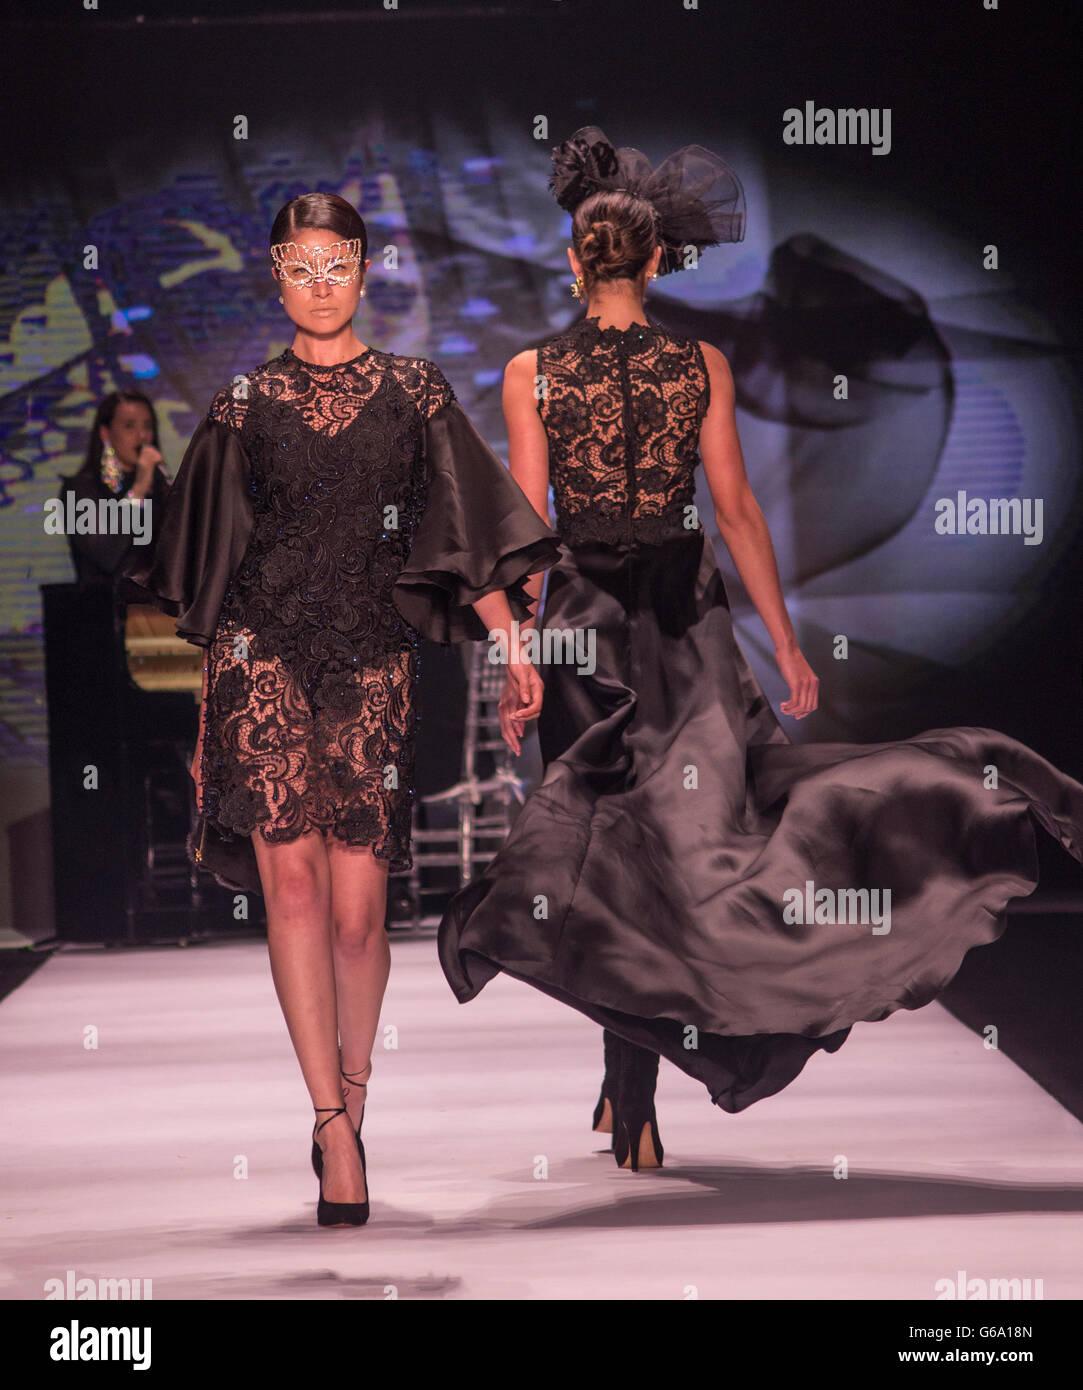 Latin models show designs in Bogotá Fashion Week - Stock Image